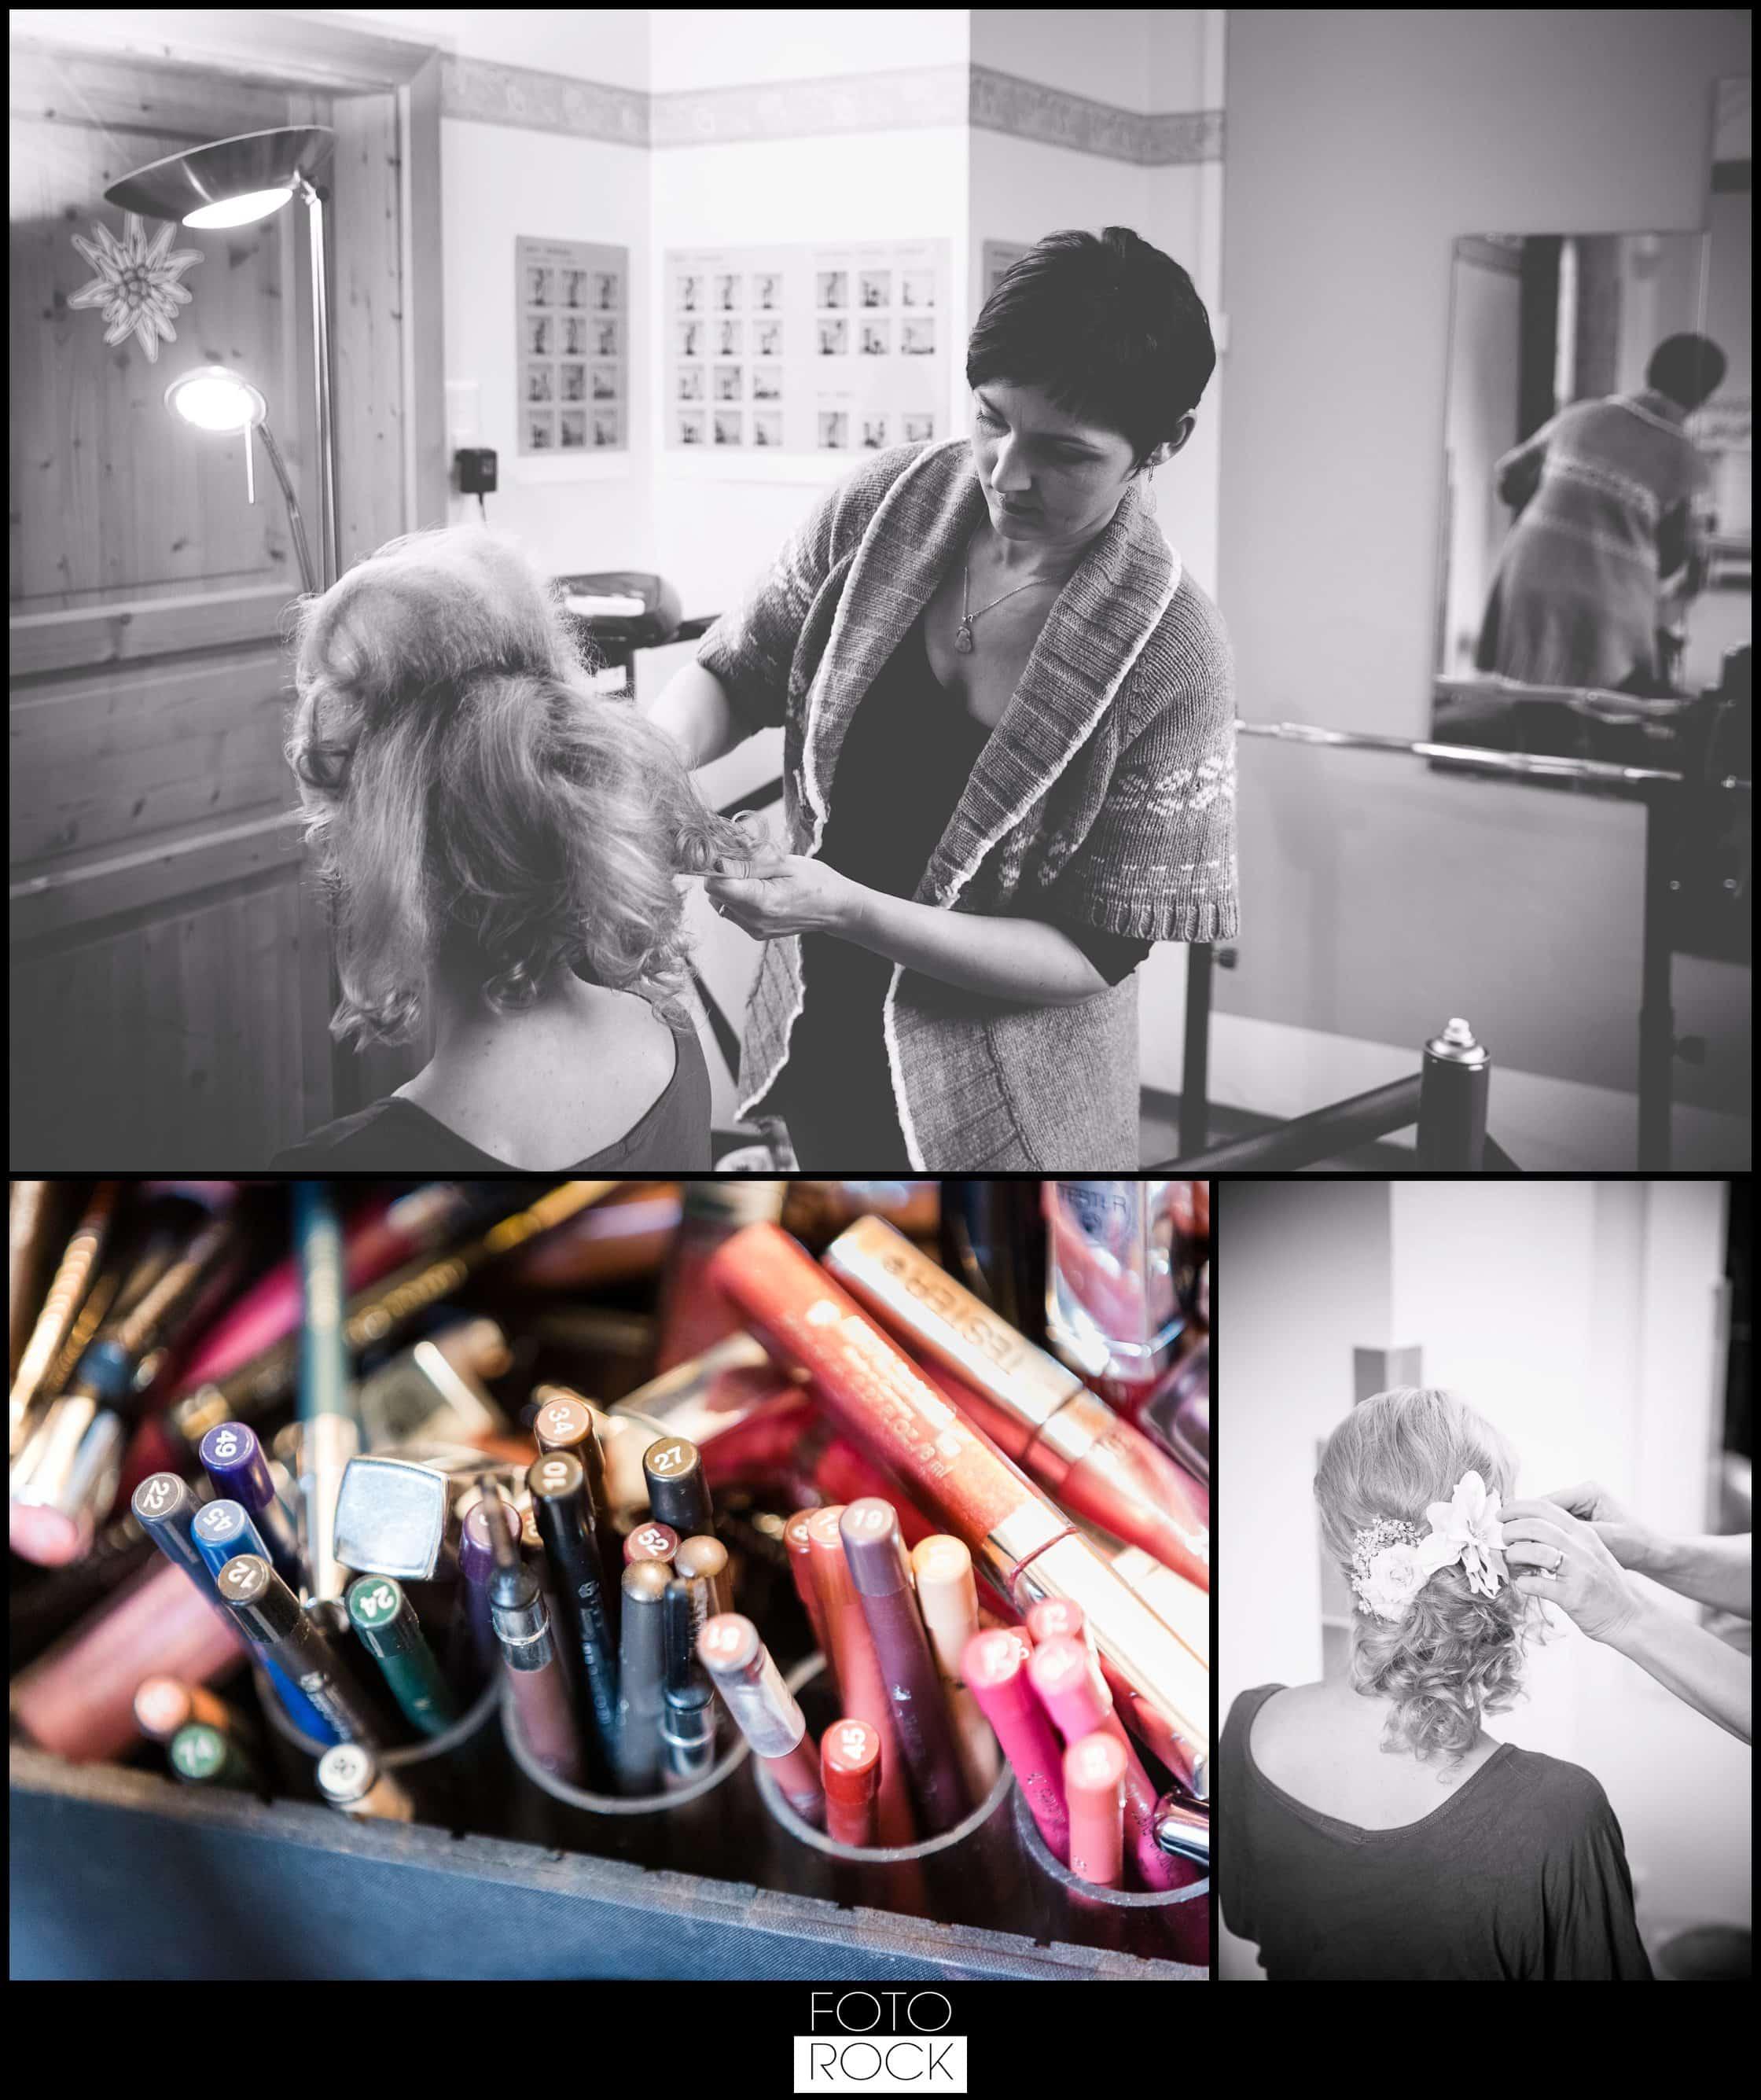 Hochzeit Winter Engelberg Styling Makeup Schminke Getting Ready